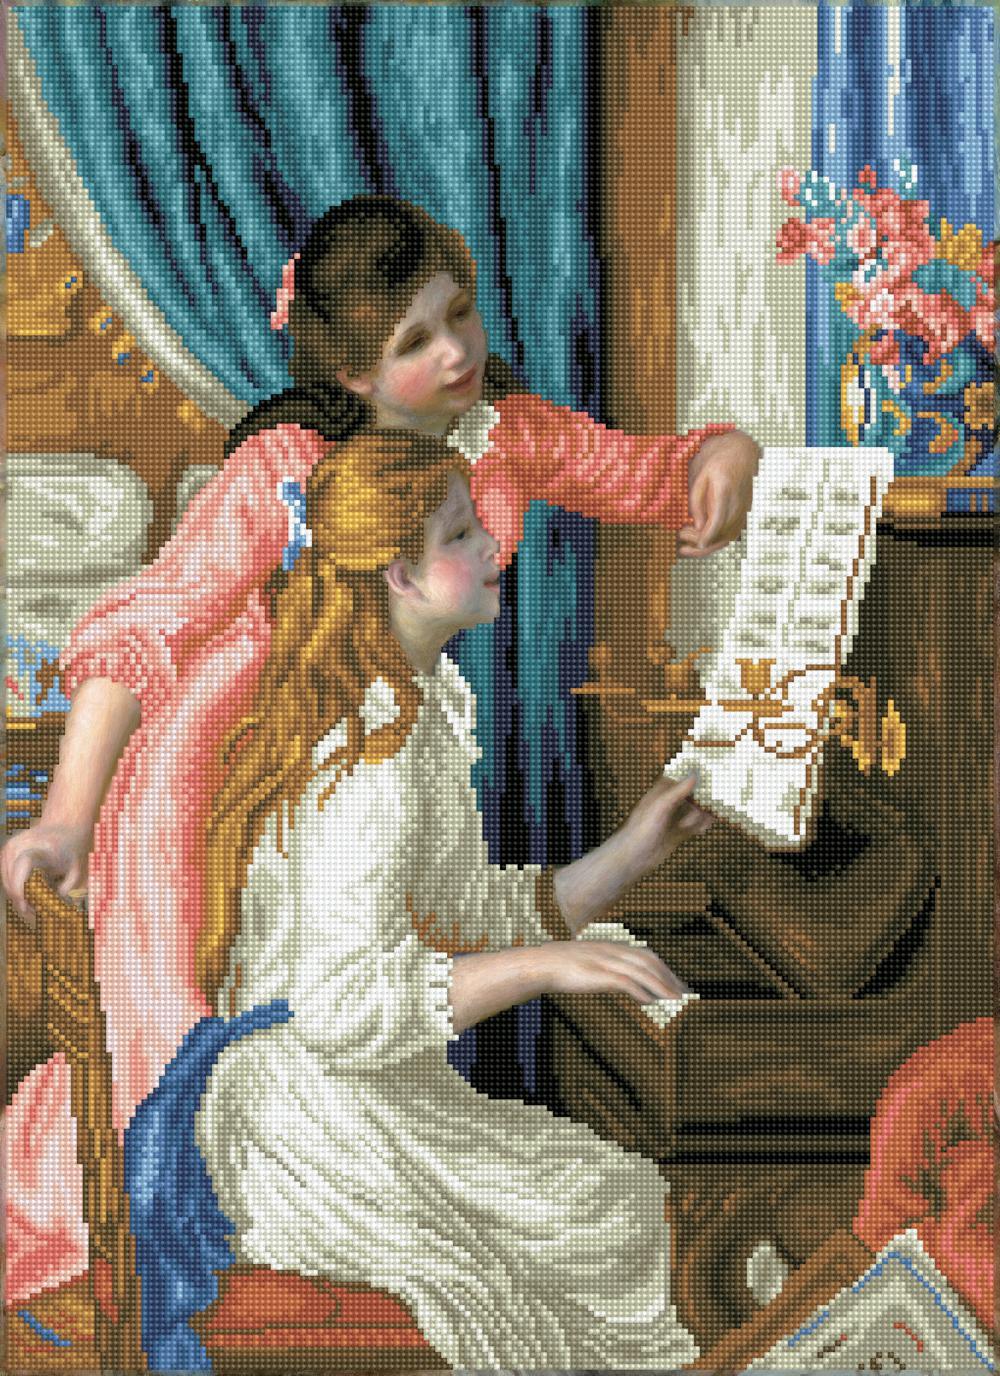 Diamond Dotz - Girls at the piano (Renoir)